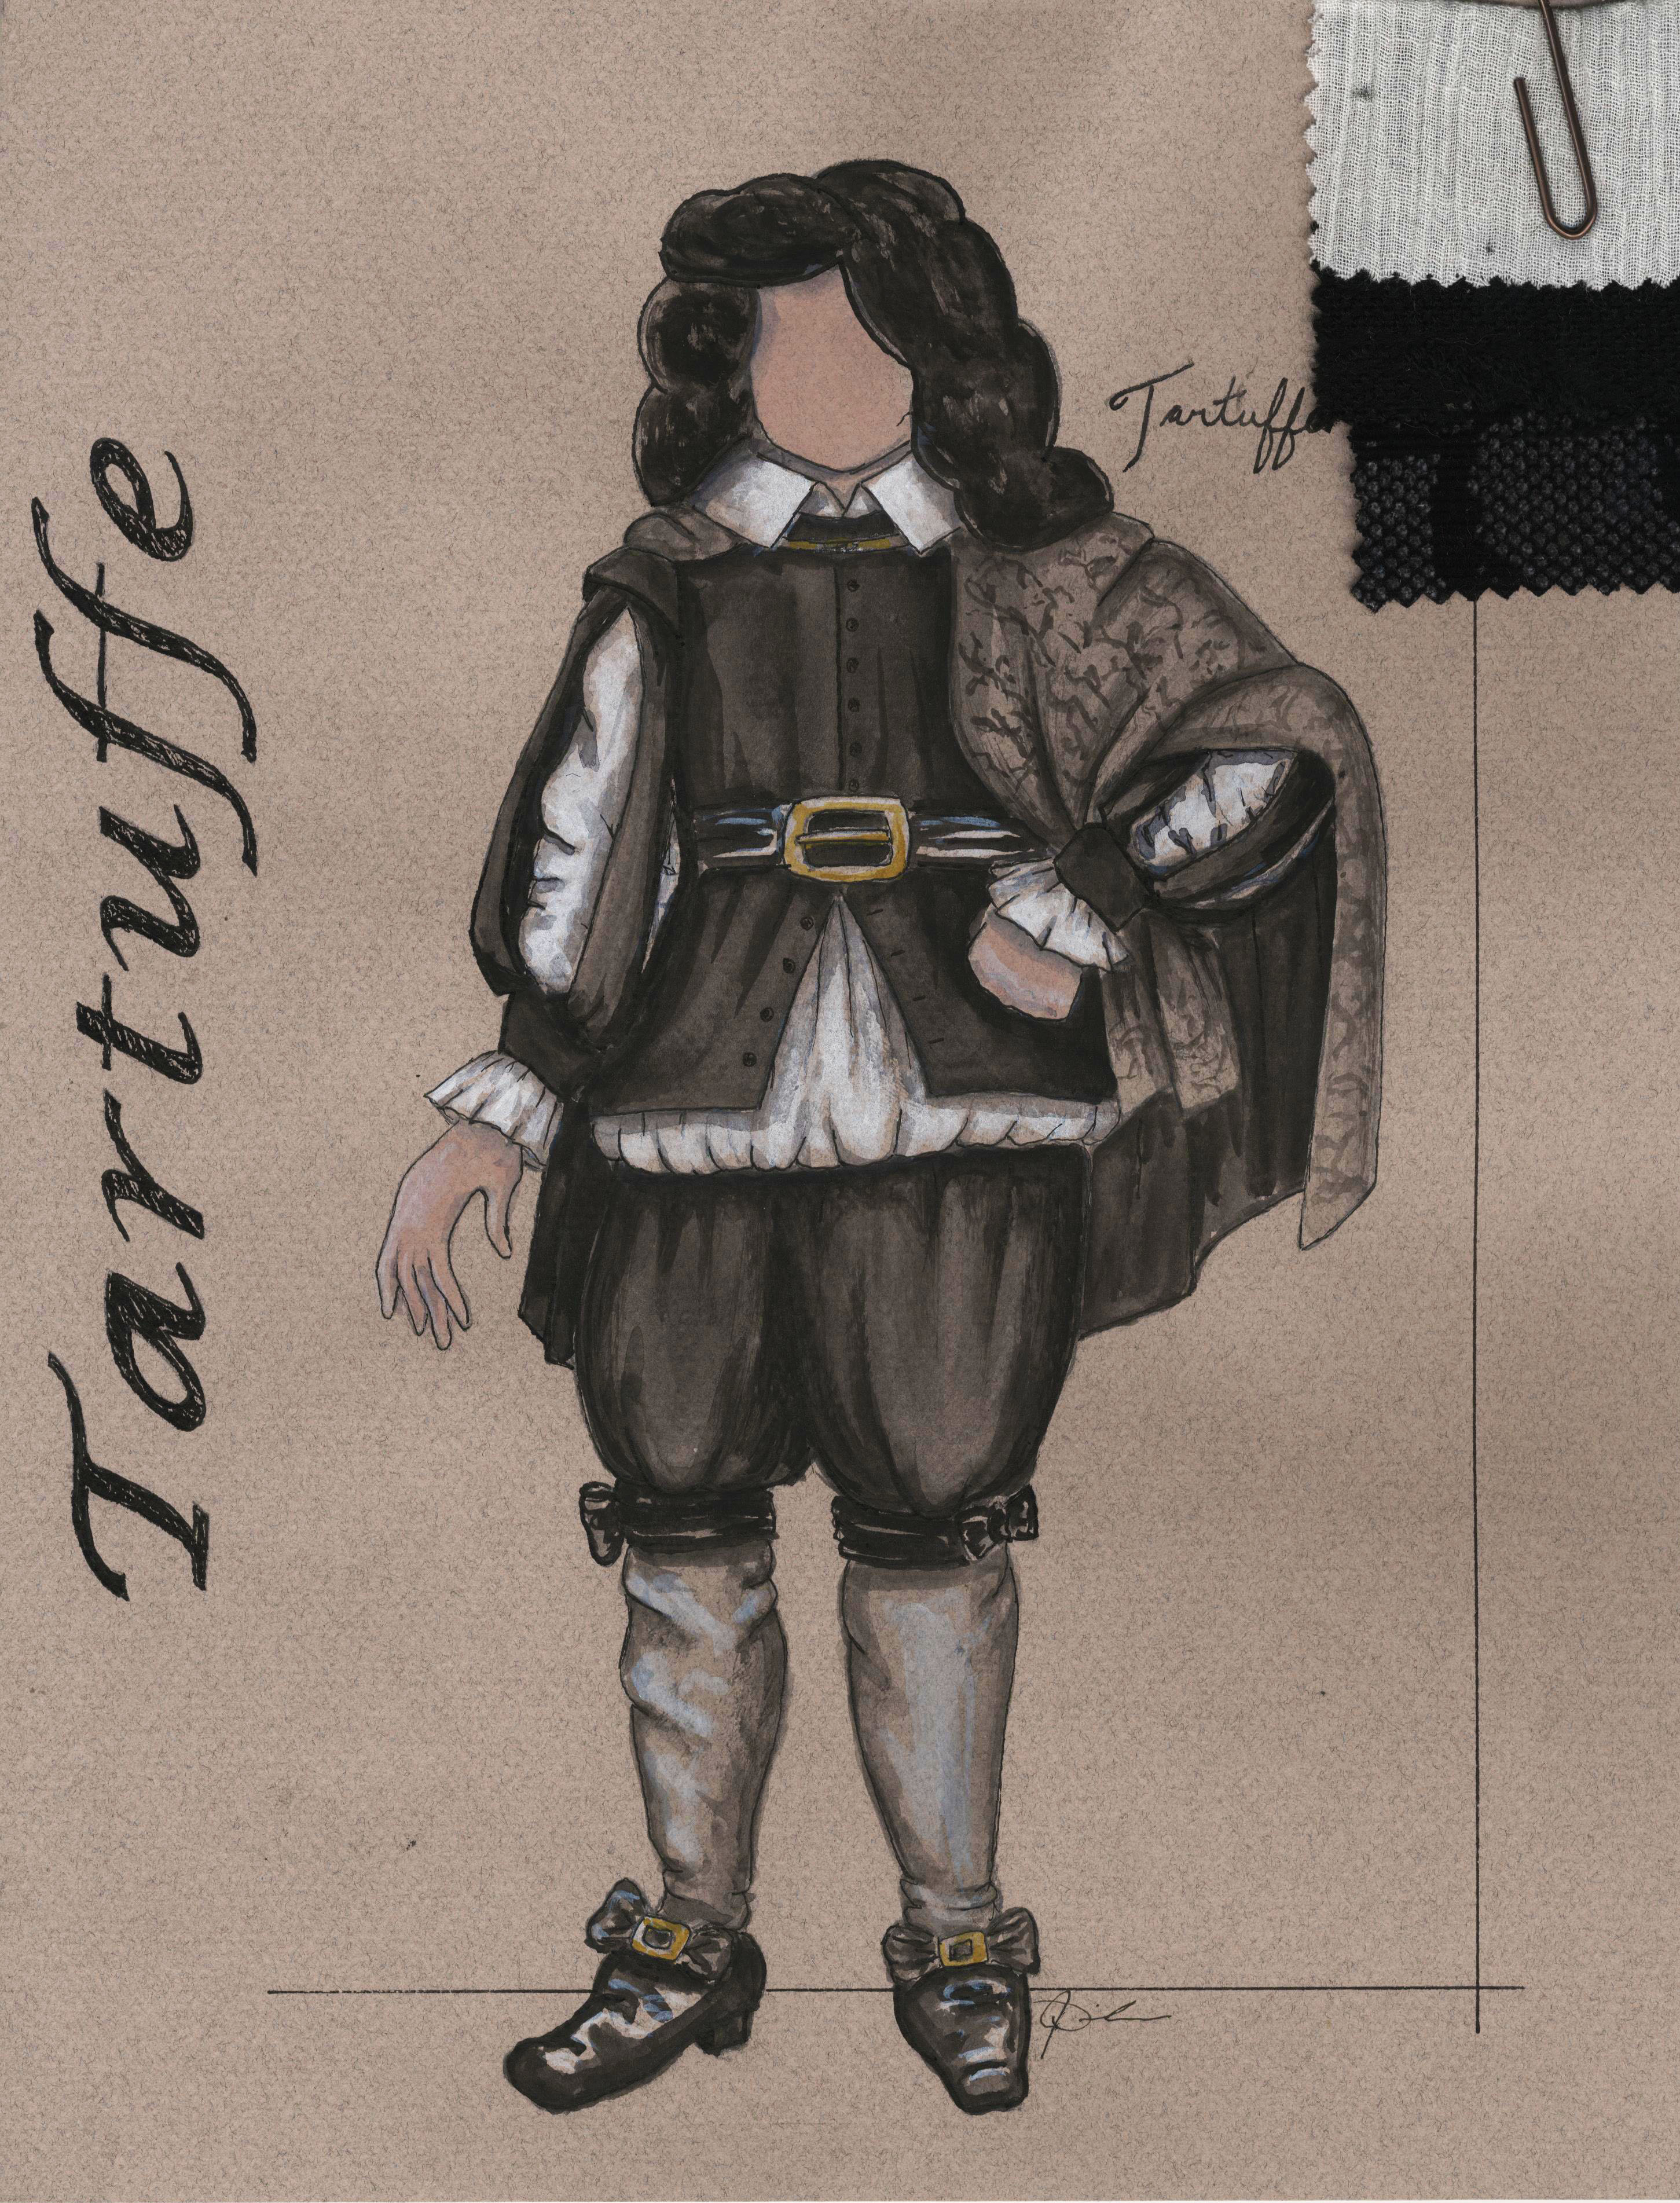 Tartuffe - Tartuffe